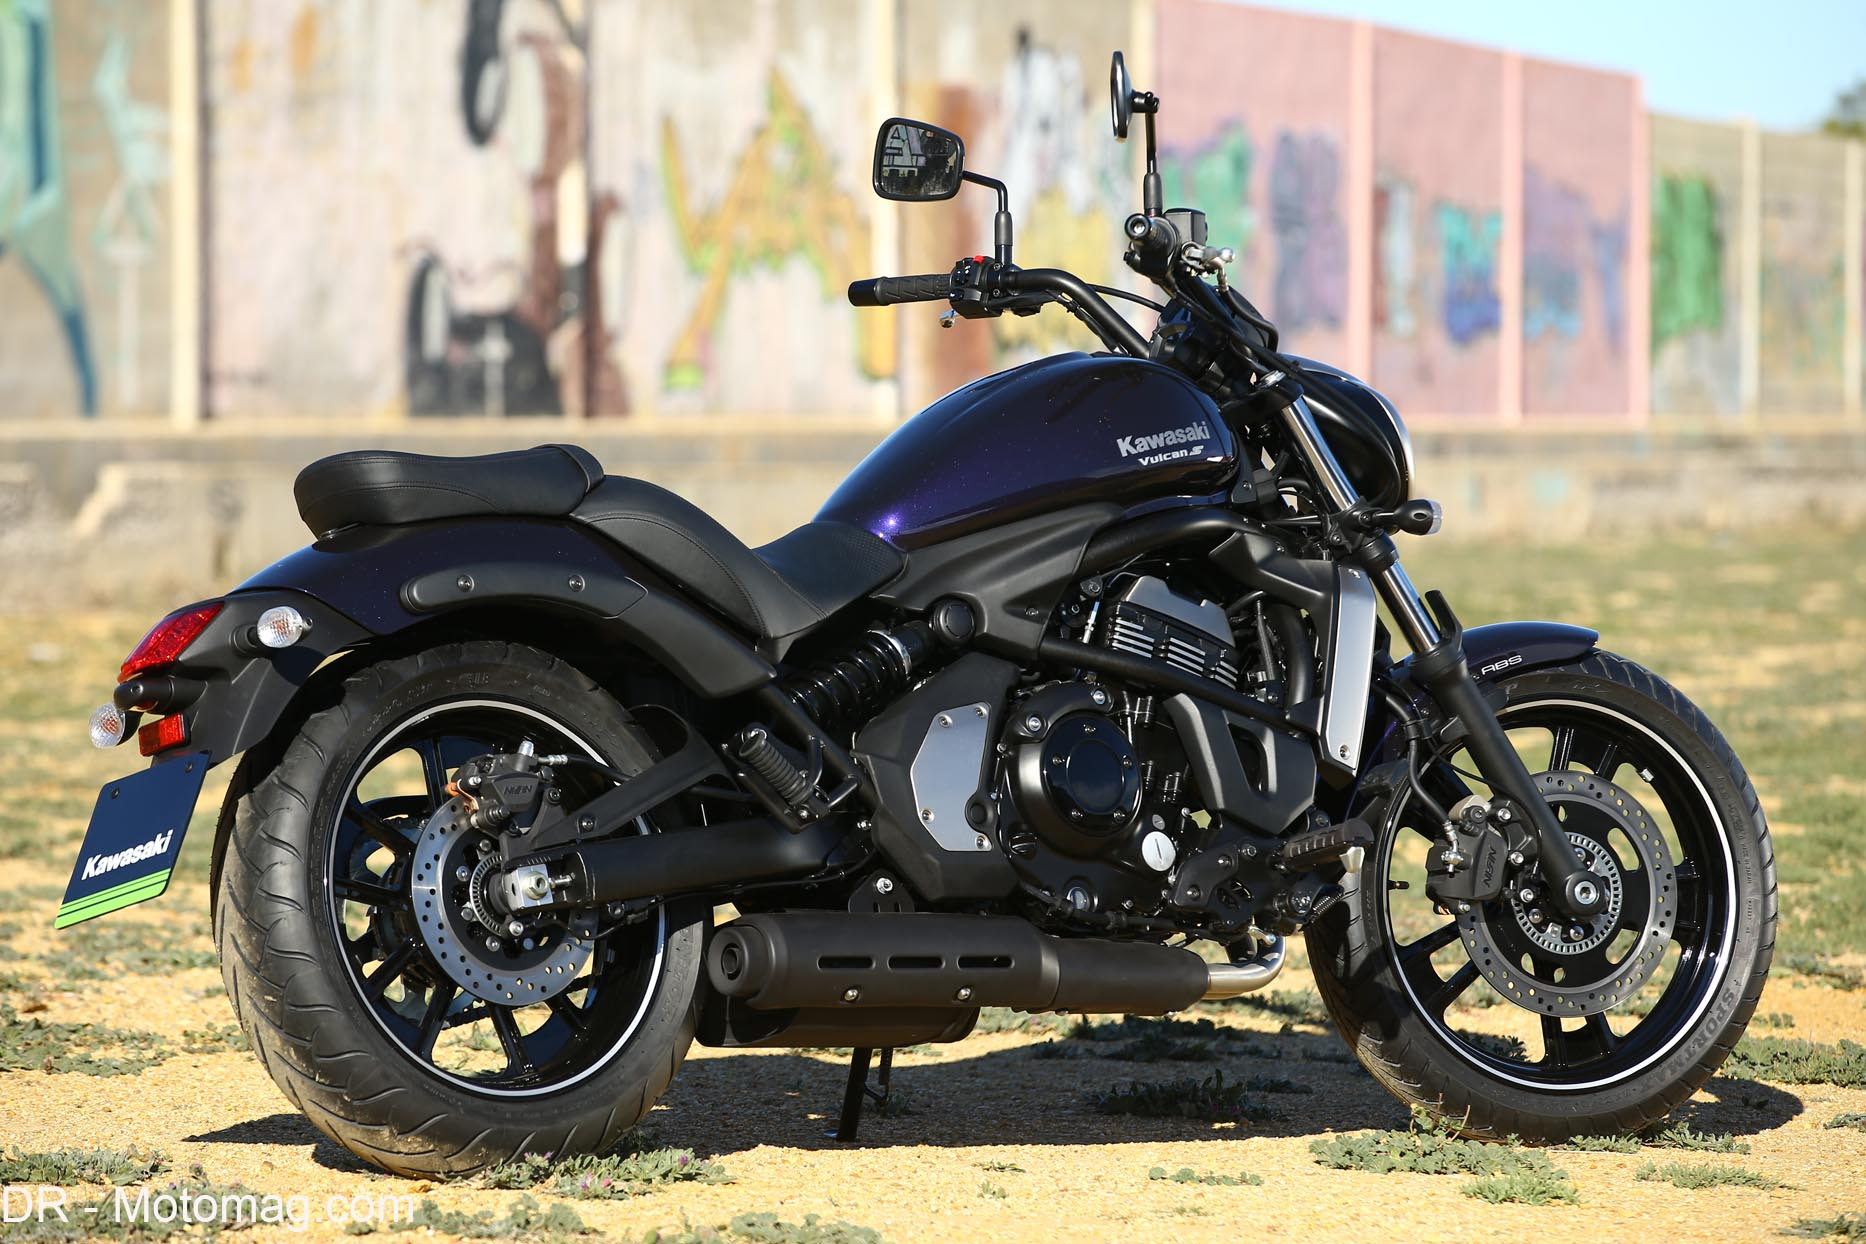 kawasaki 650 vulcan s custom r jouissant moto magazine leader de l actualit de la moto et. Black Bedroom Furniture Sets. Home Design Ideas